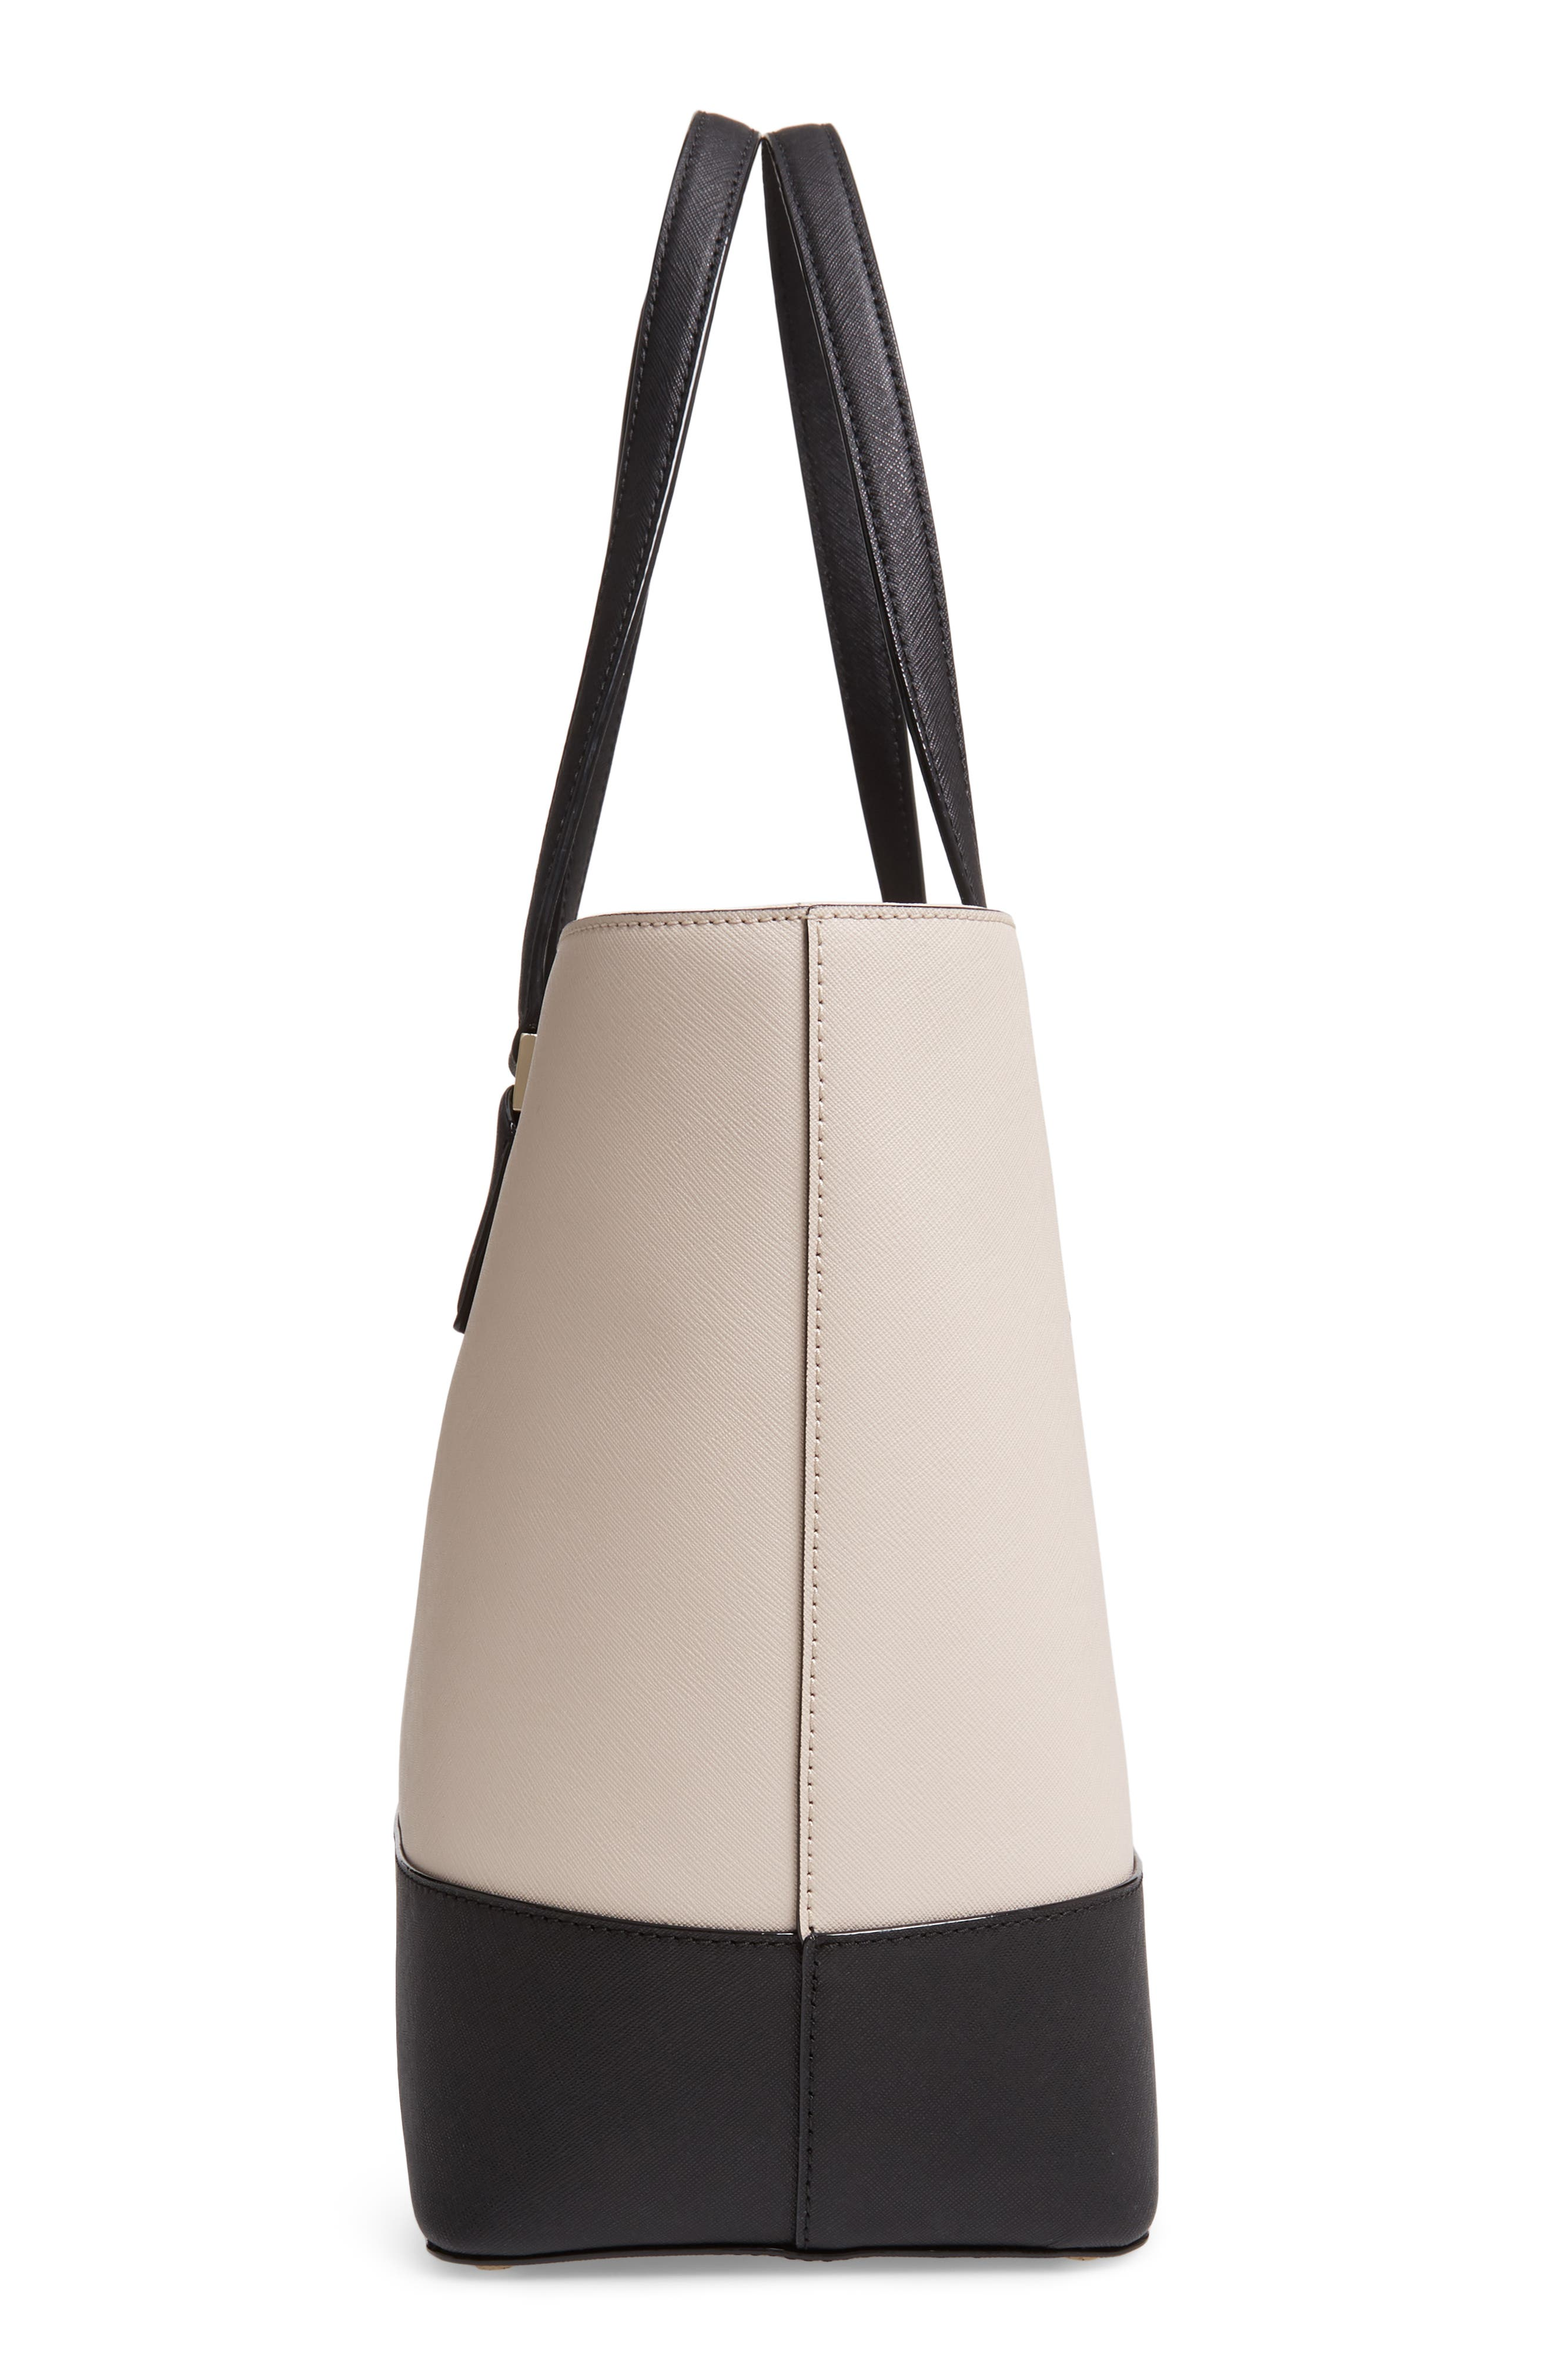 medium cameron street - harmony saffiano leather tote,                             Alternate thumbnail 5, color,                             TUSK/ BLACK